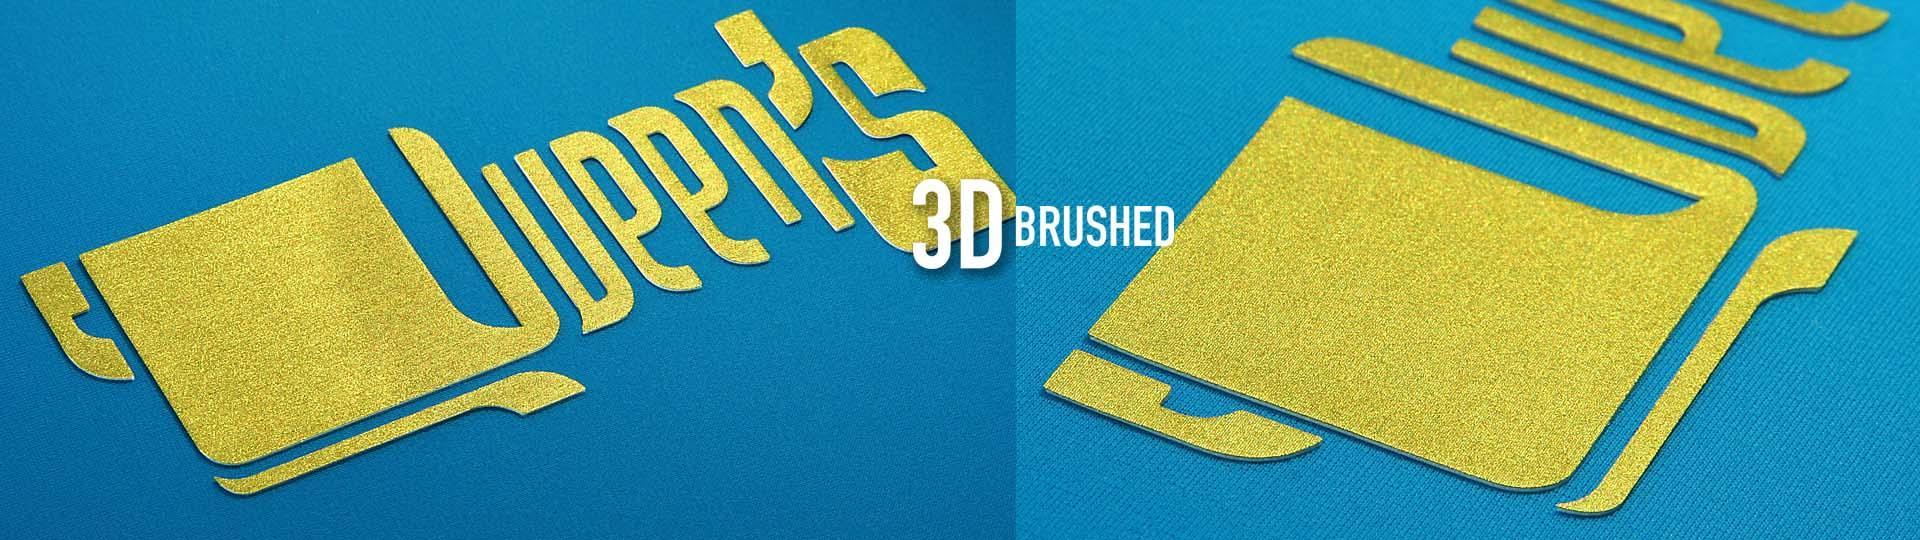 3D TRANSFER - image 4